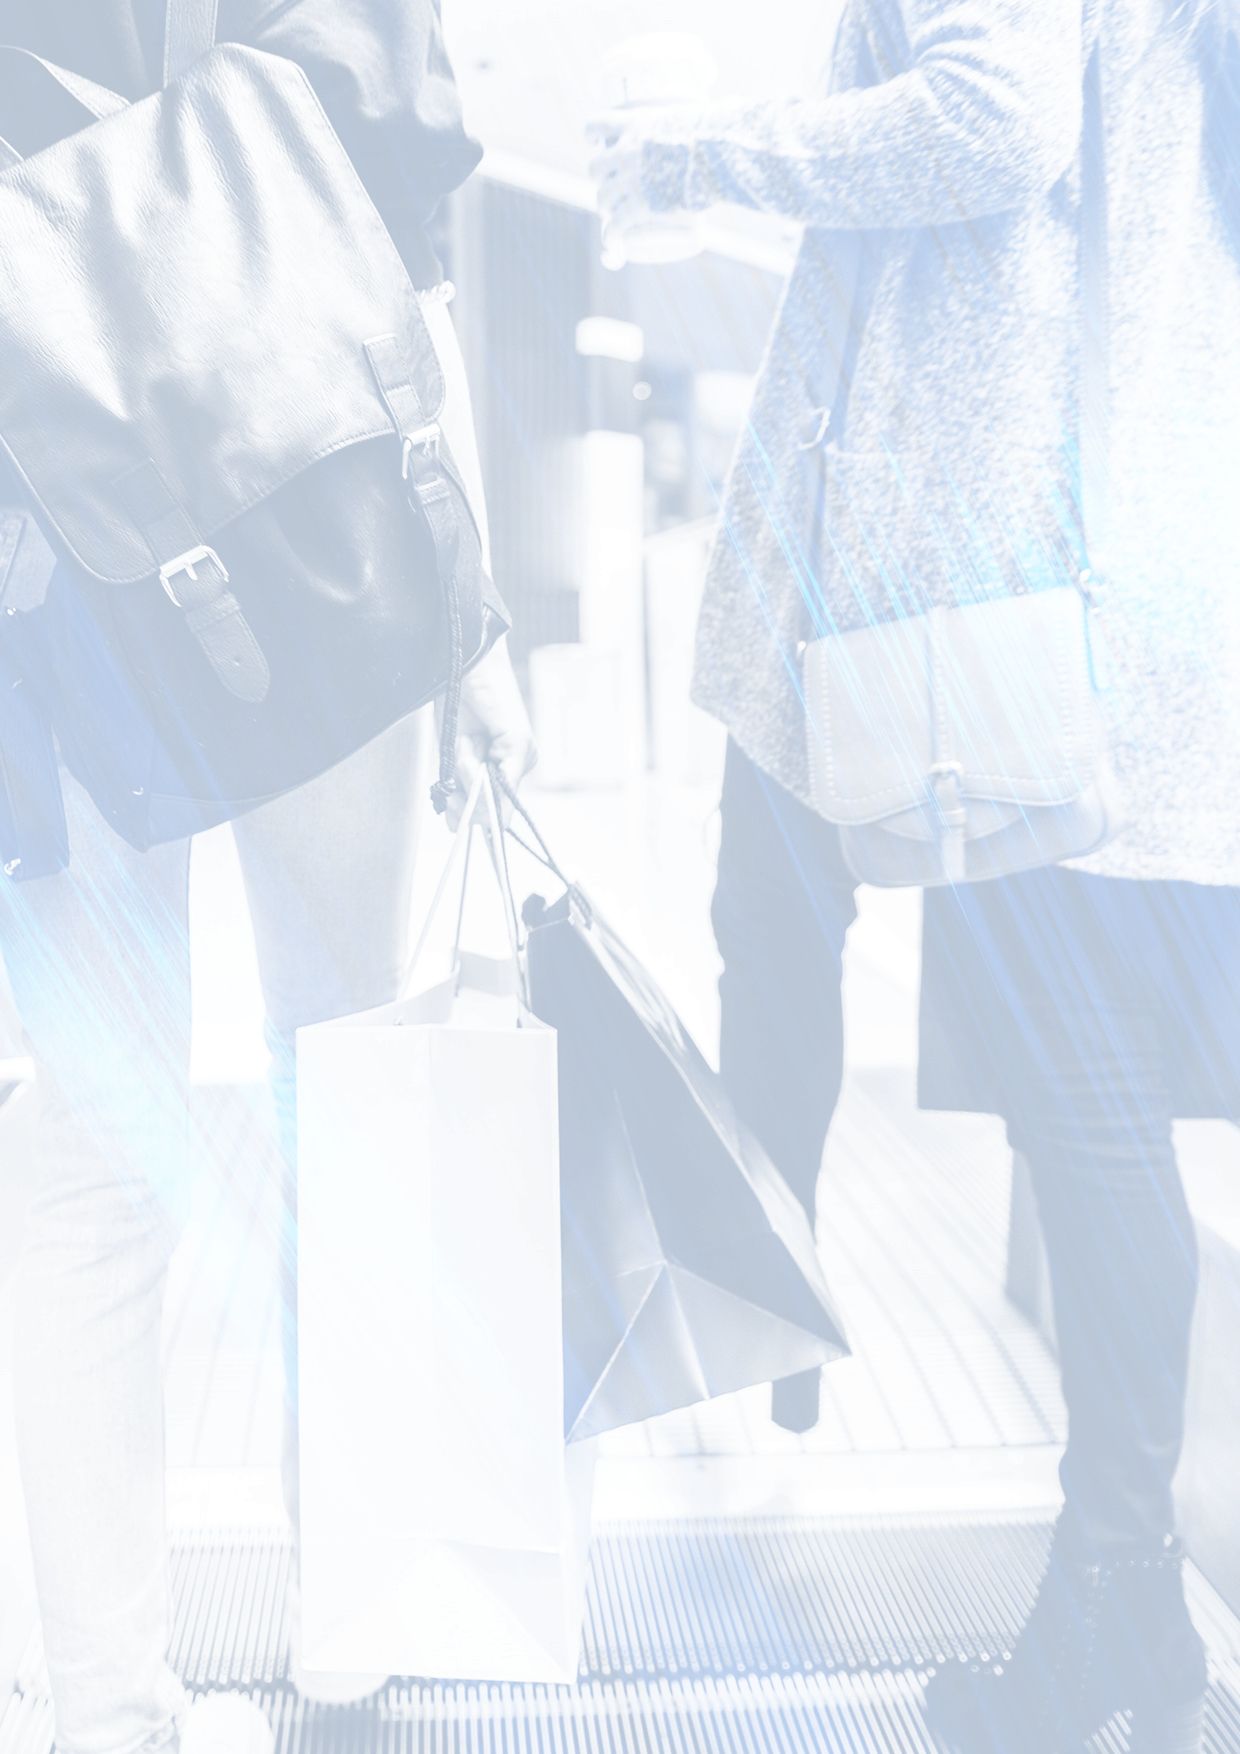 Market Dynamics: Retail